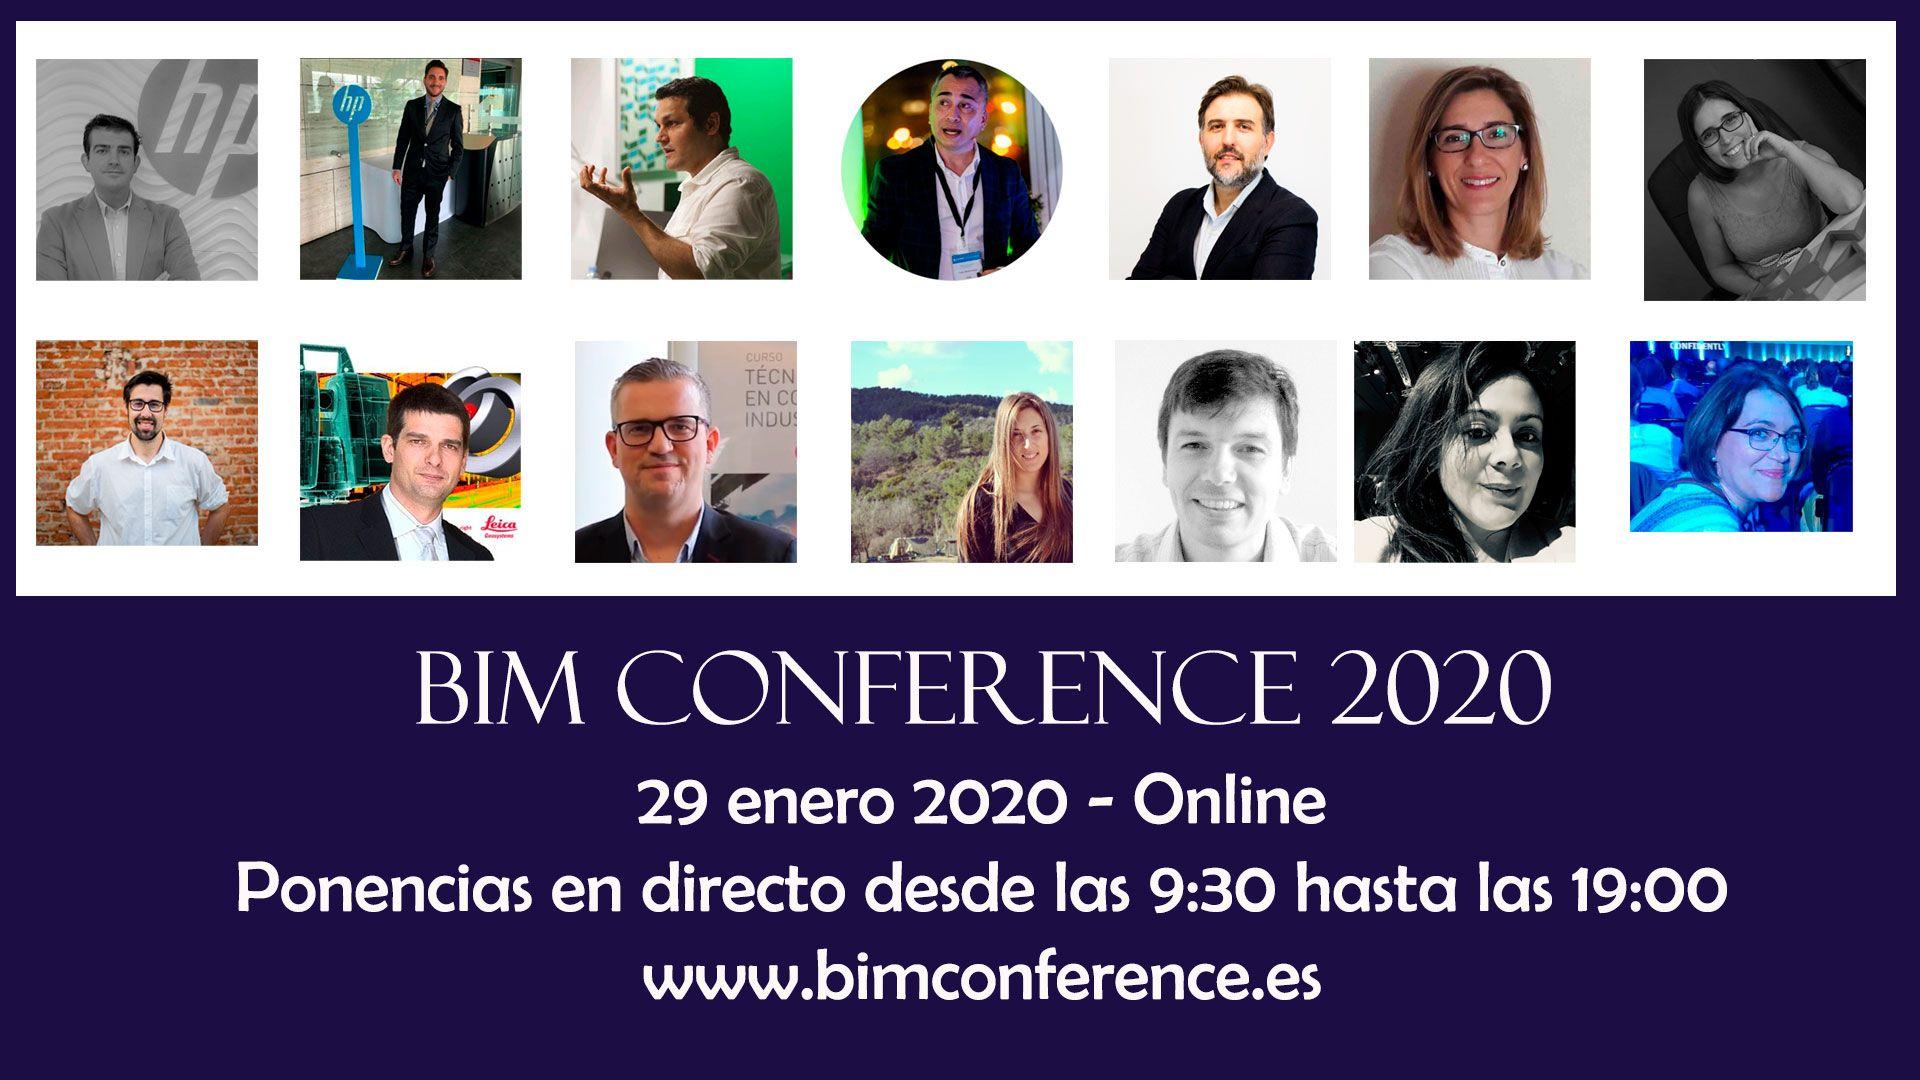 BIM Conference 2020